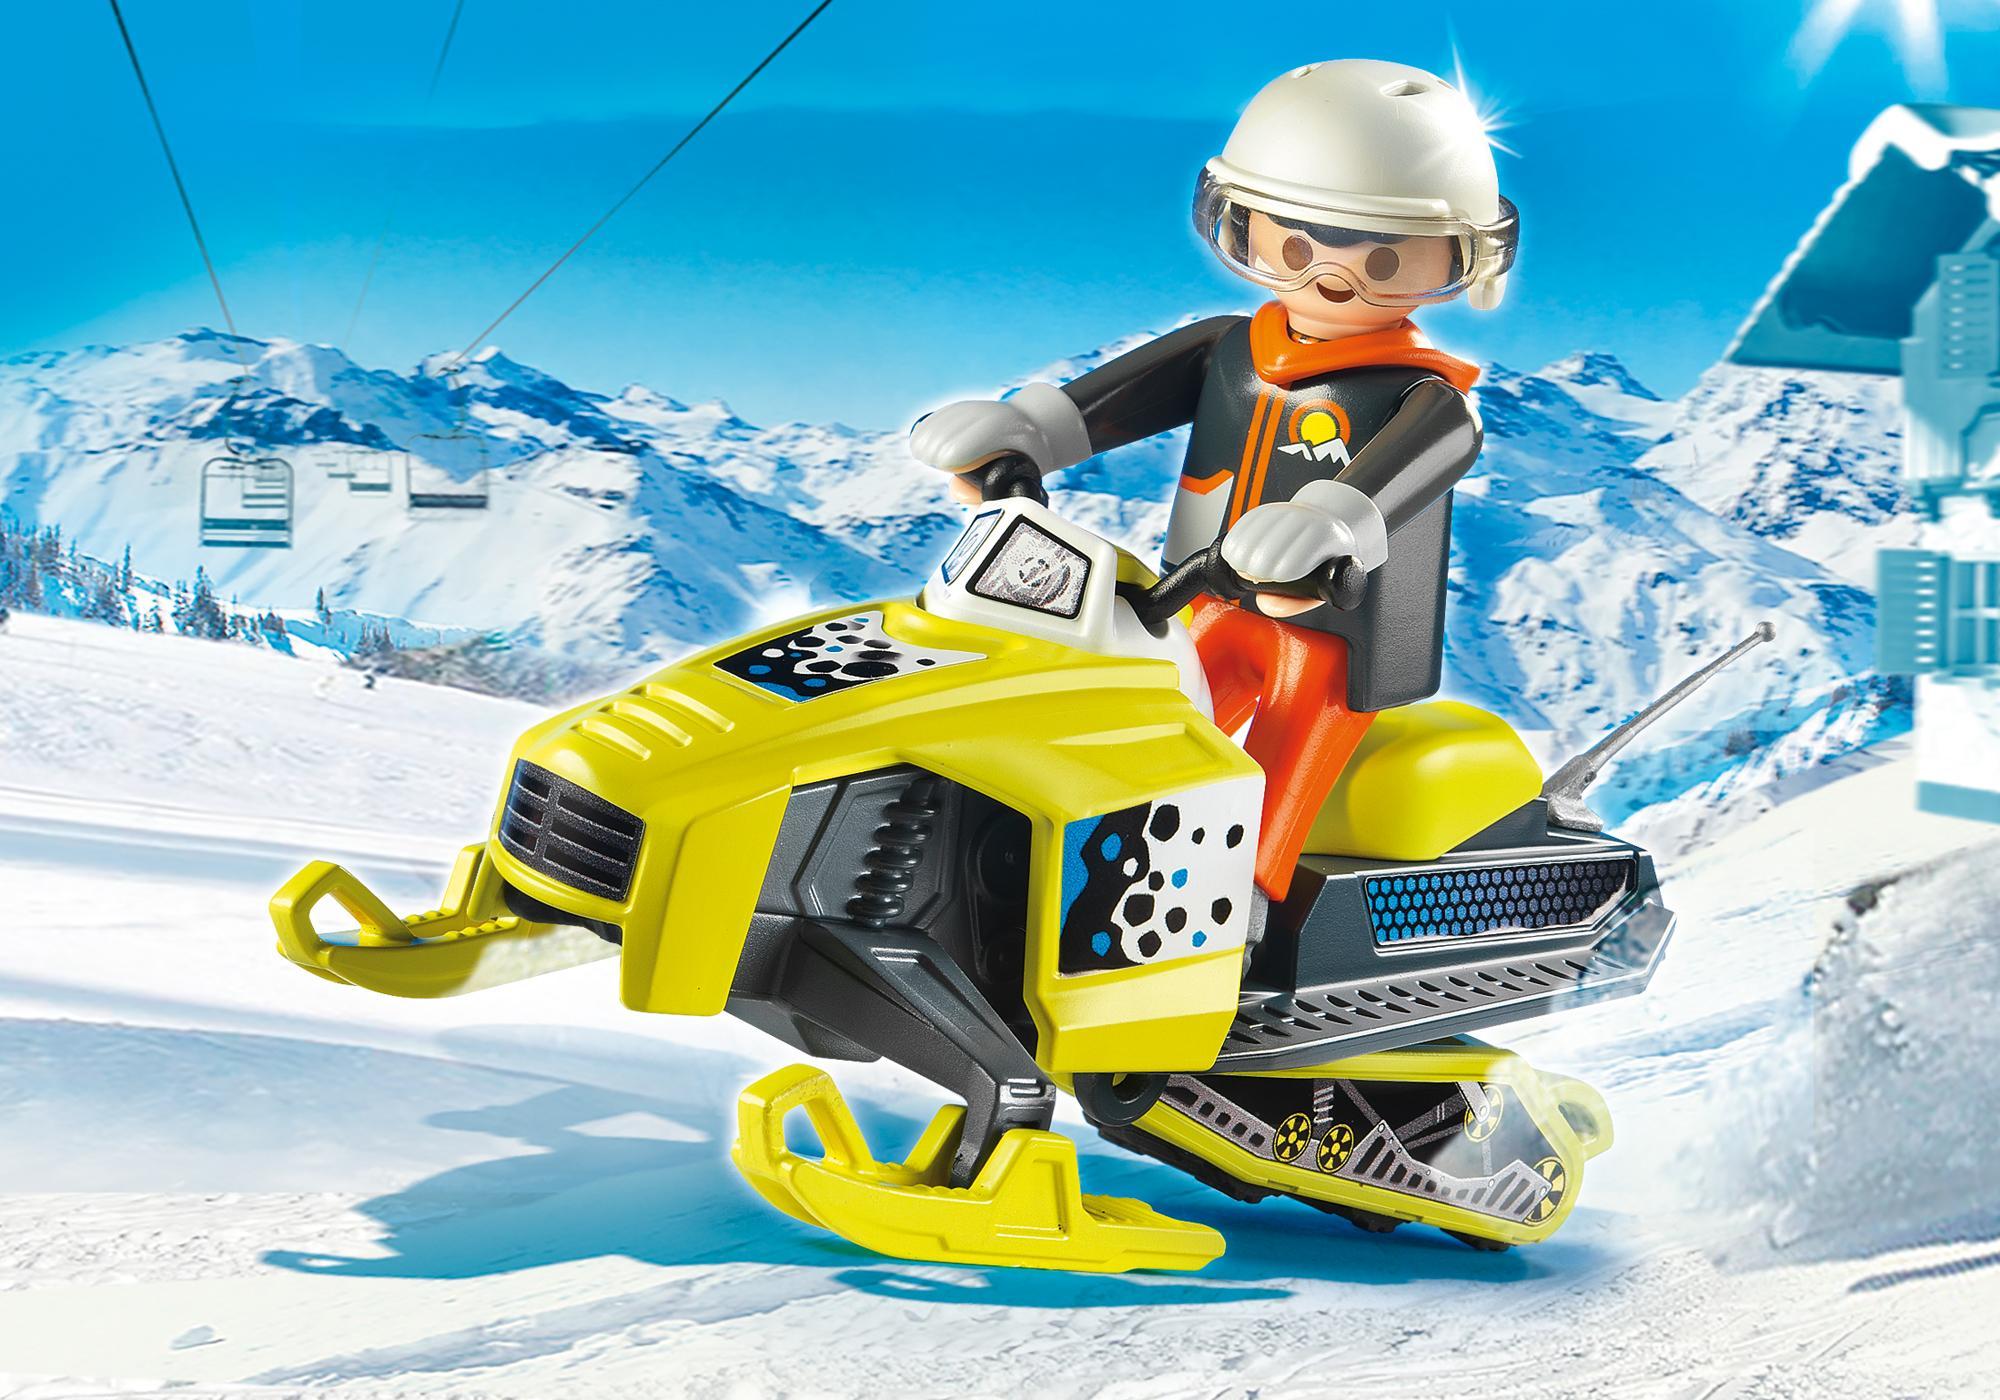 http://media.playmobil.com/i/playmobil/9285_product_detail/Schneemobil